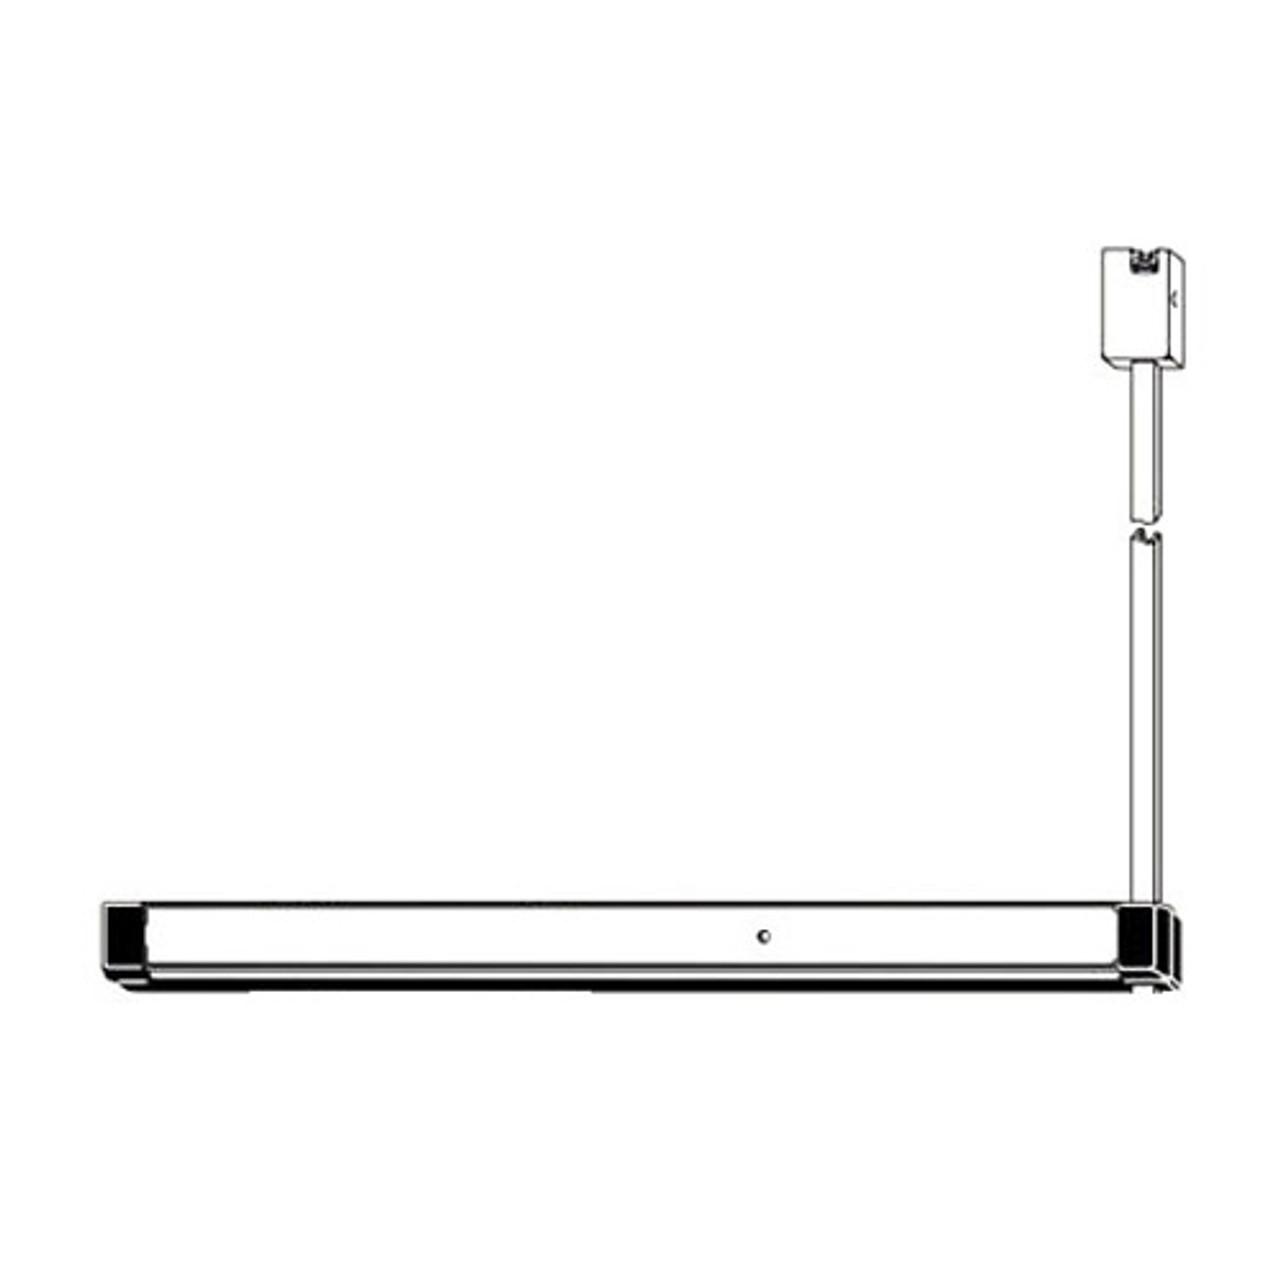 8222T-CM-30 Adams Rite Narrow Stile Surface Vertical Rod Exit Device in Dark Bronze